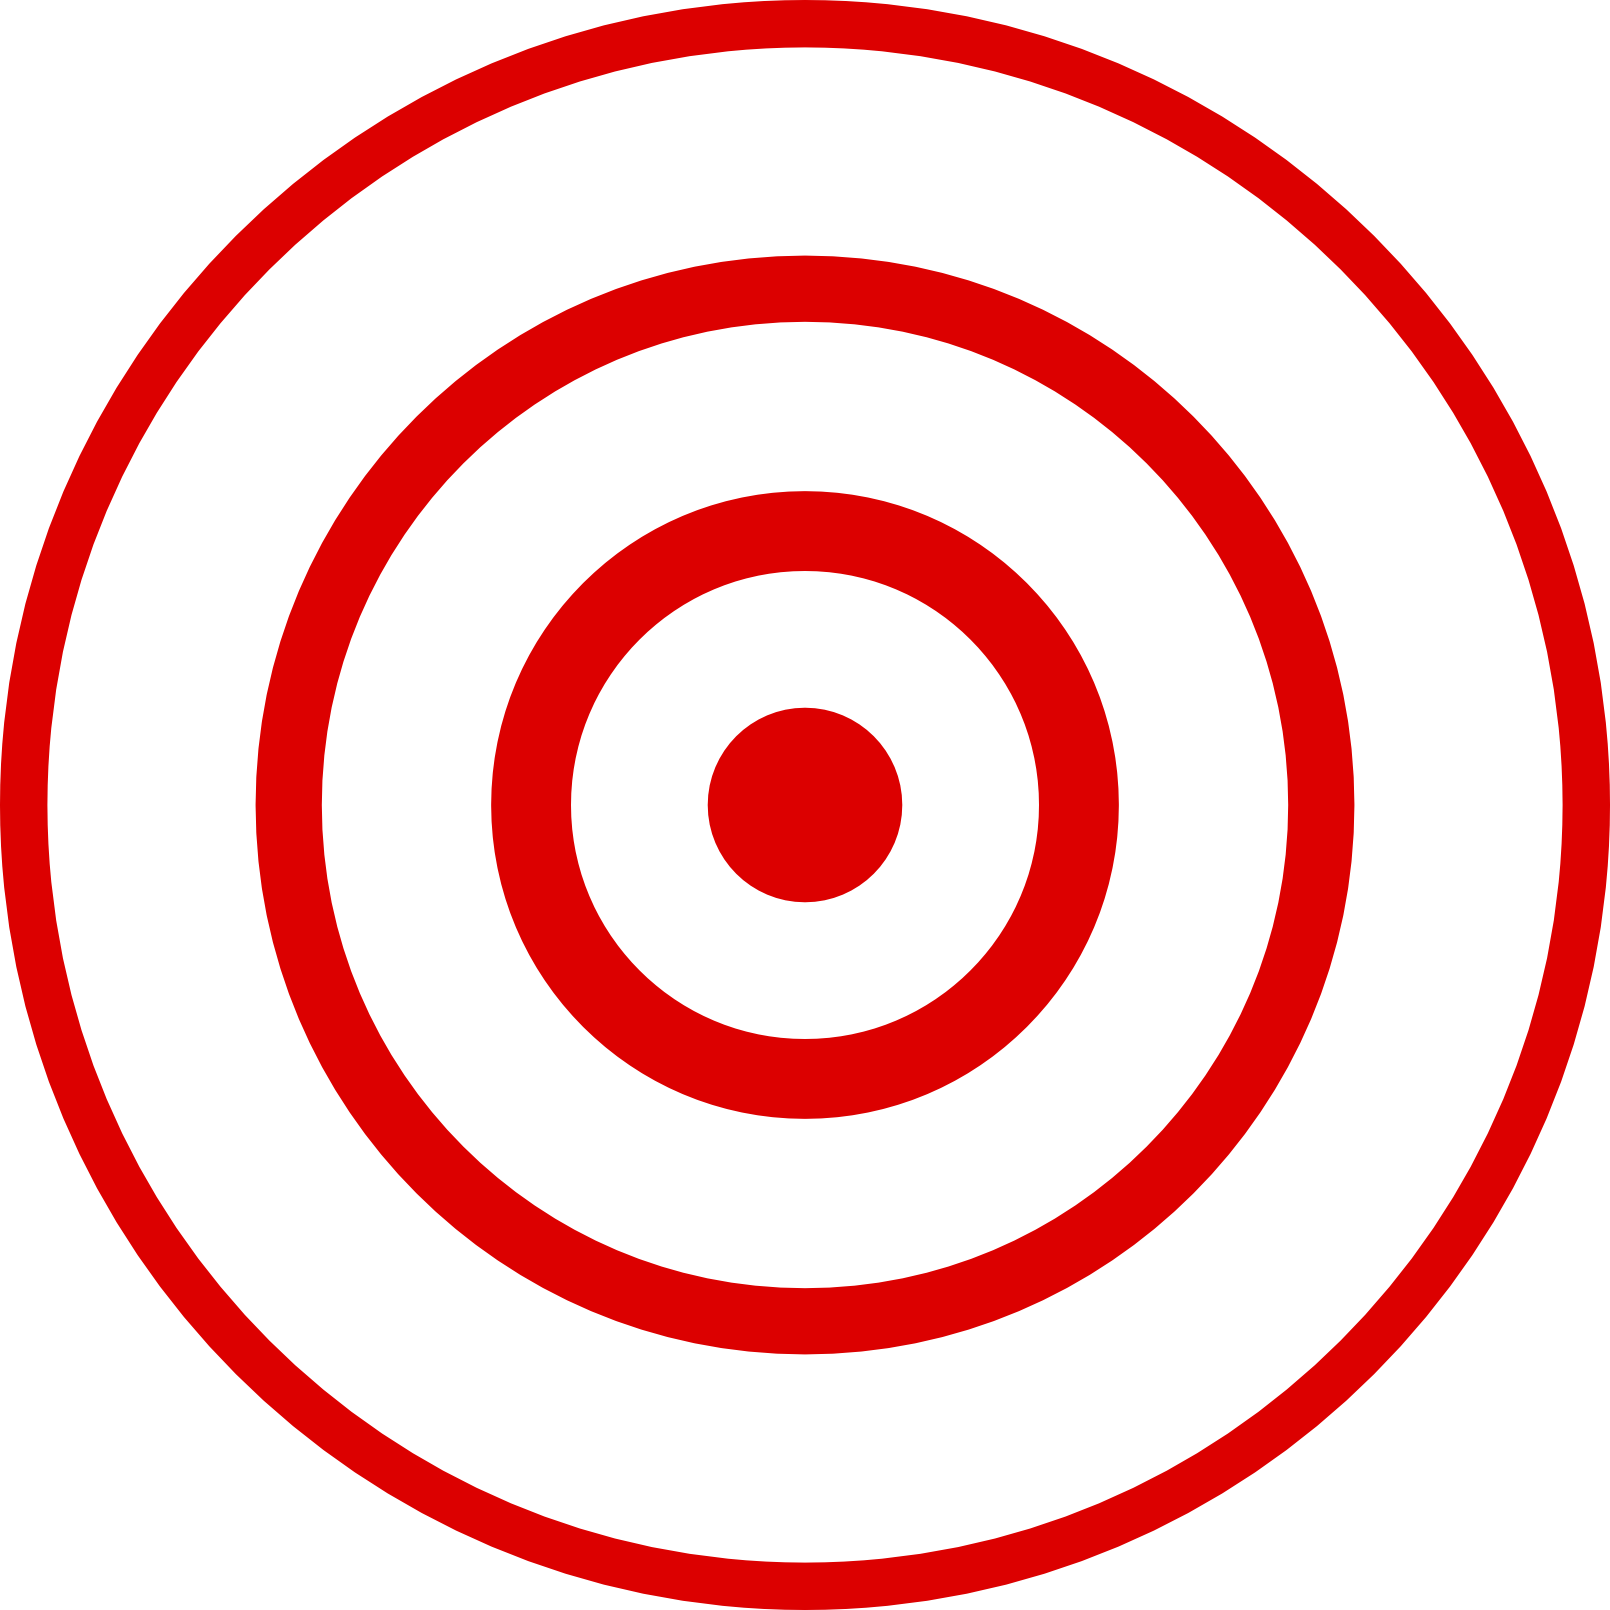 ... Bullseye Clipart - clipartall ...